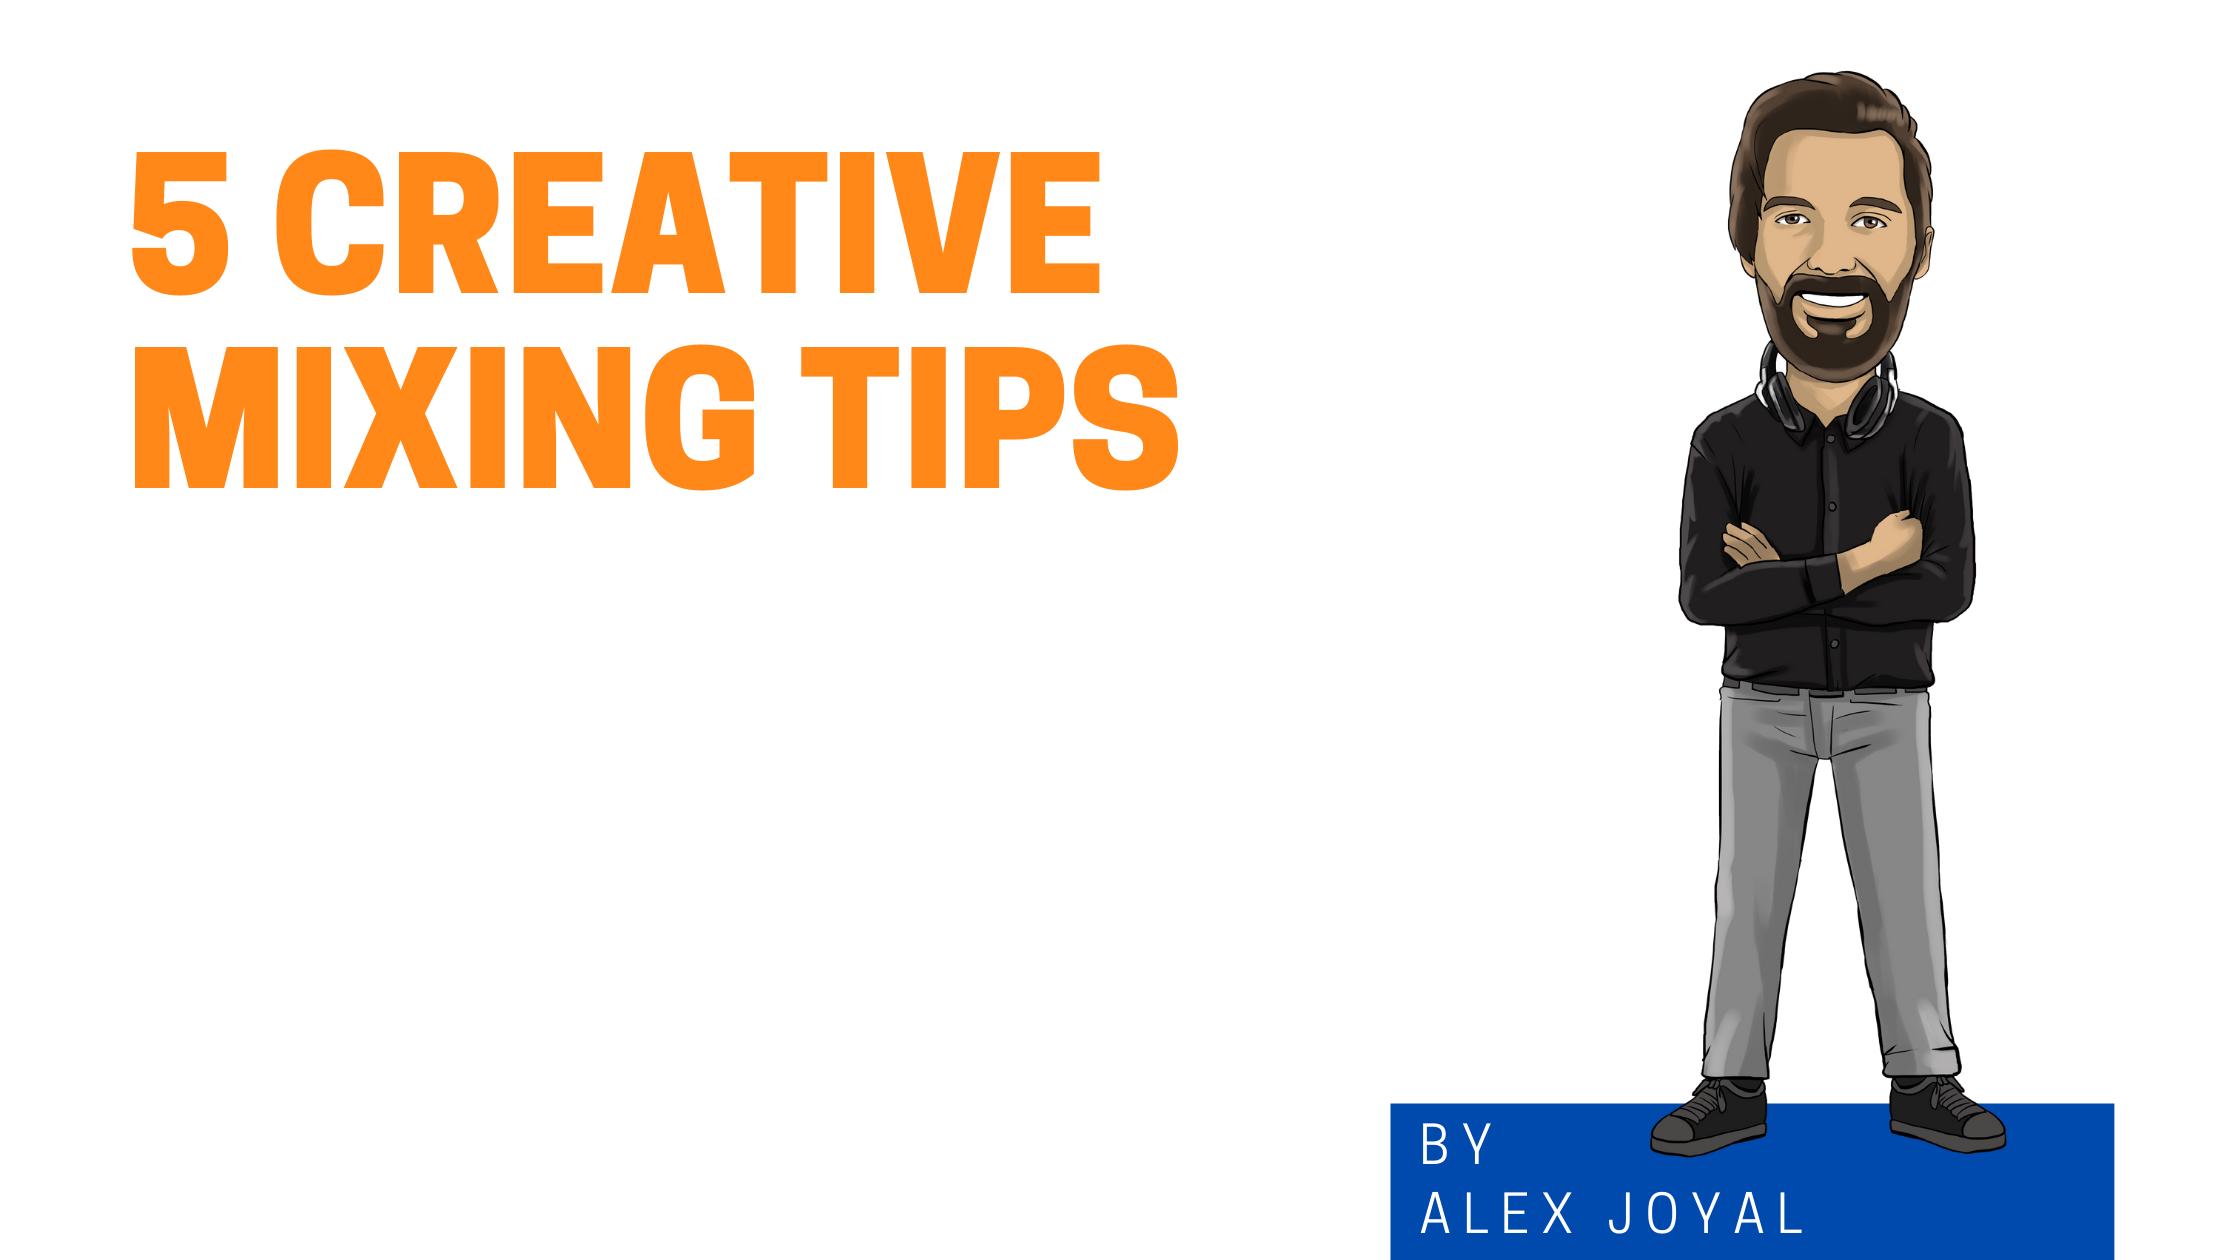 5 Creative Mixing Tips cartoon graphic of Alex